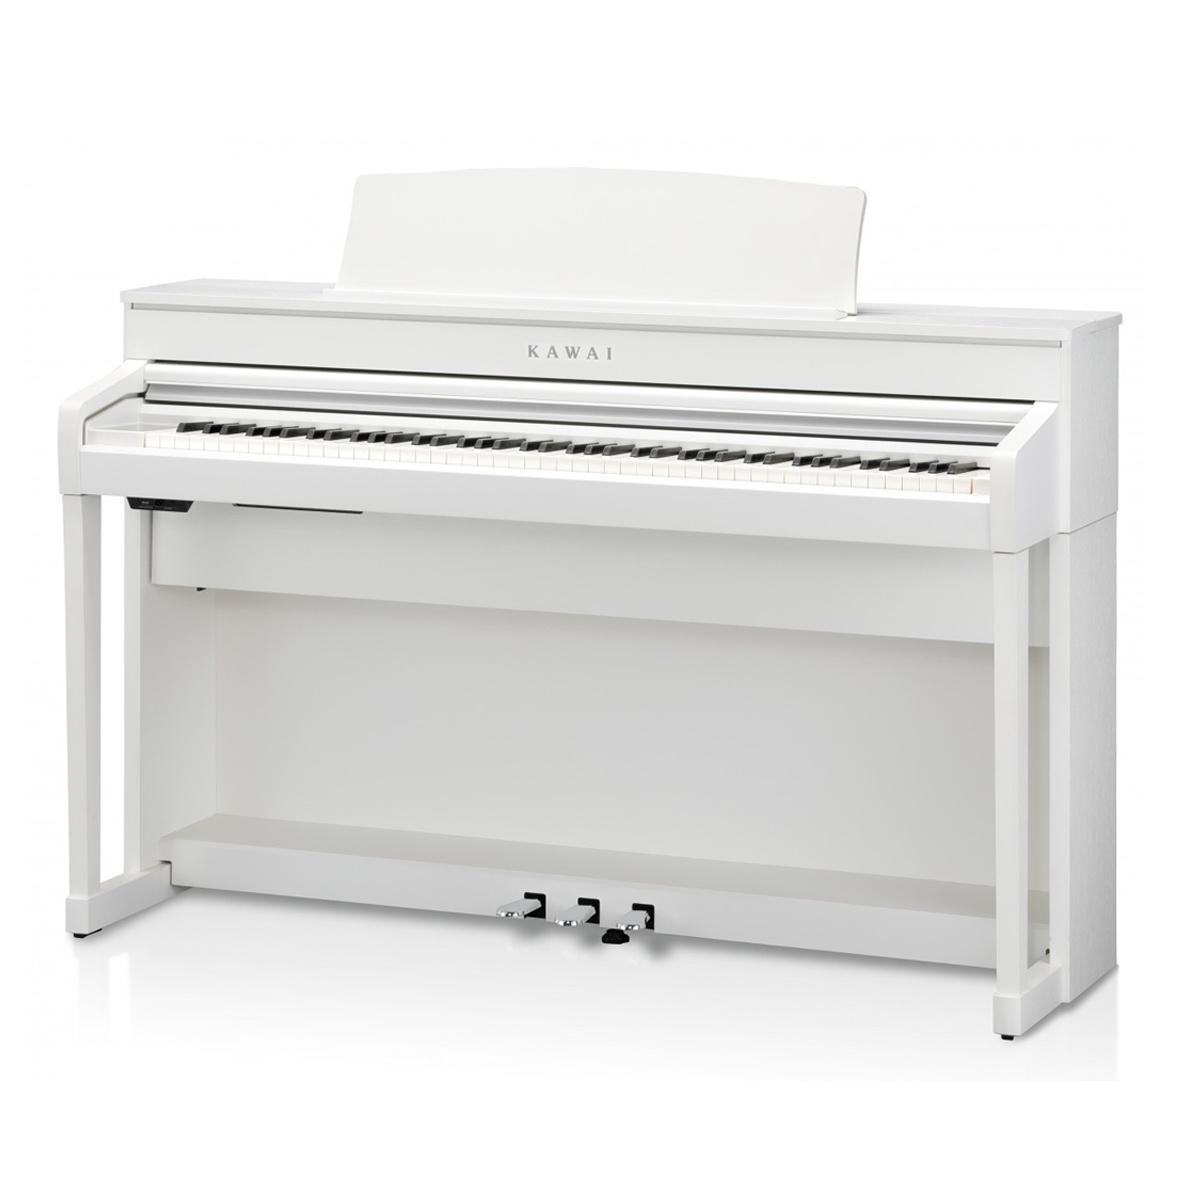 Kawai - Digital und E Piano Kawai CA 79 WH